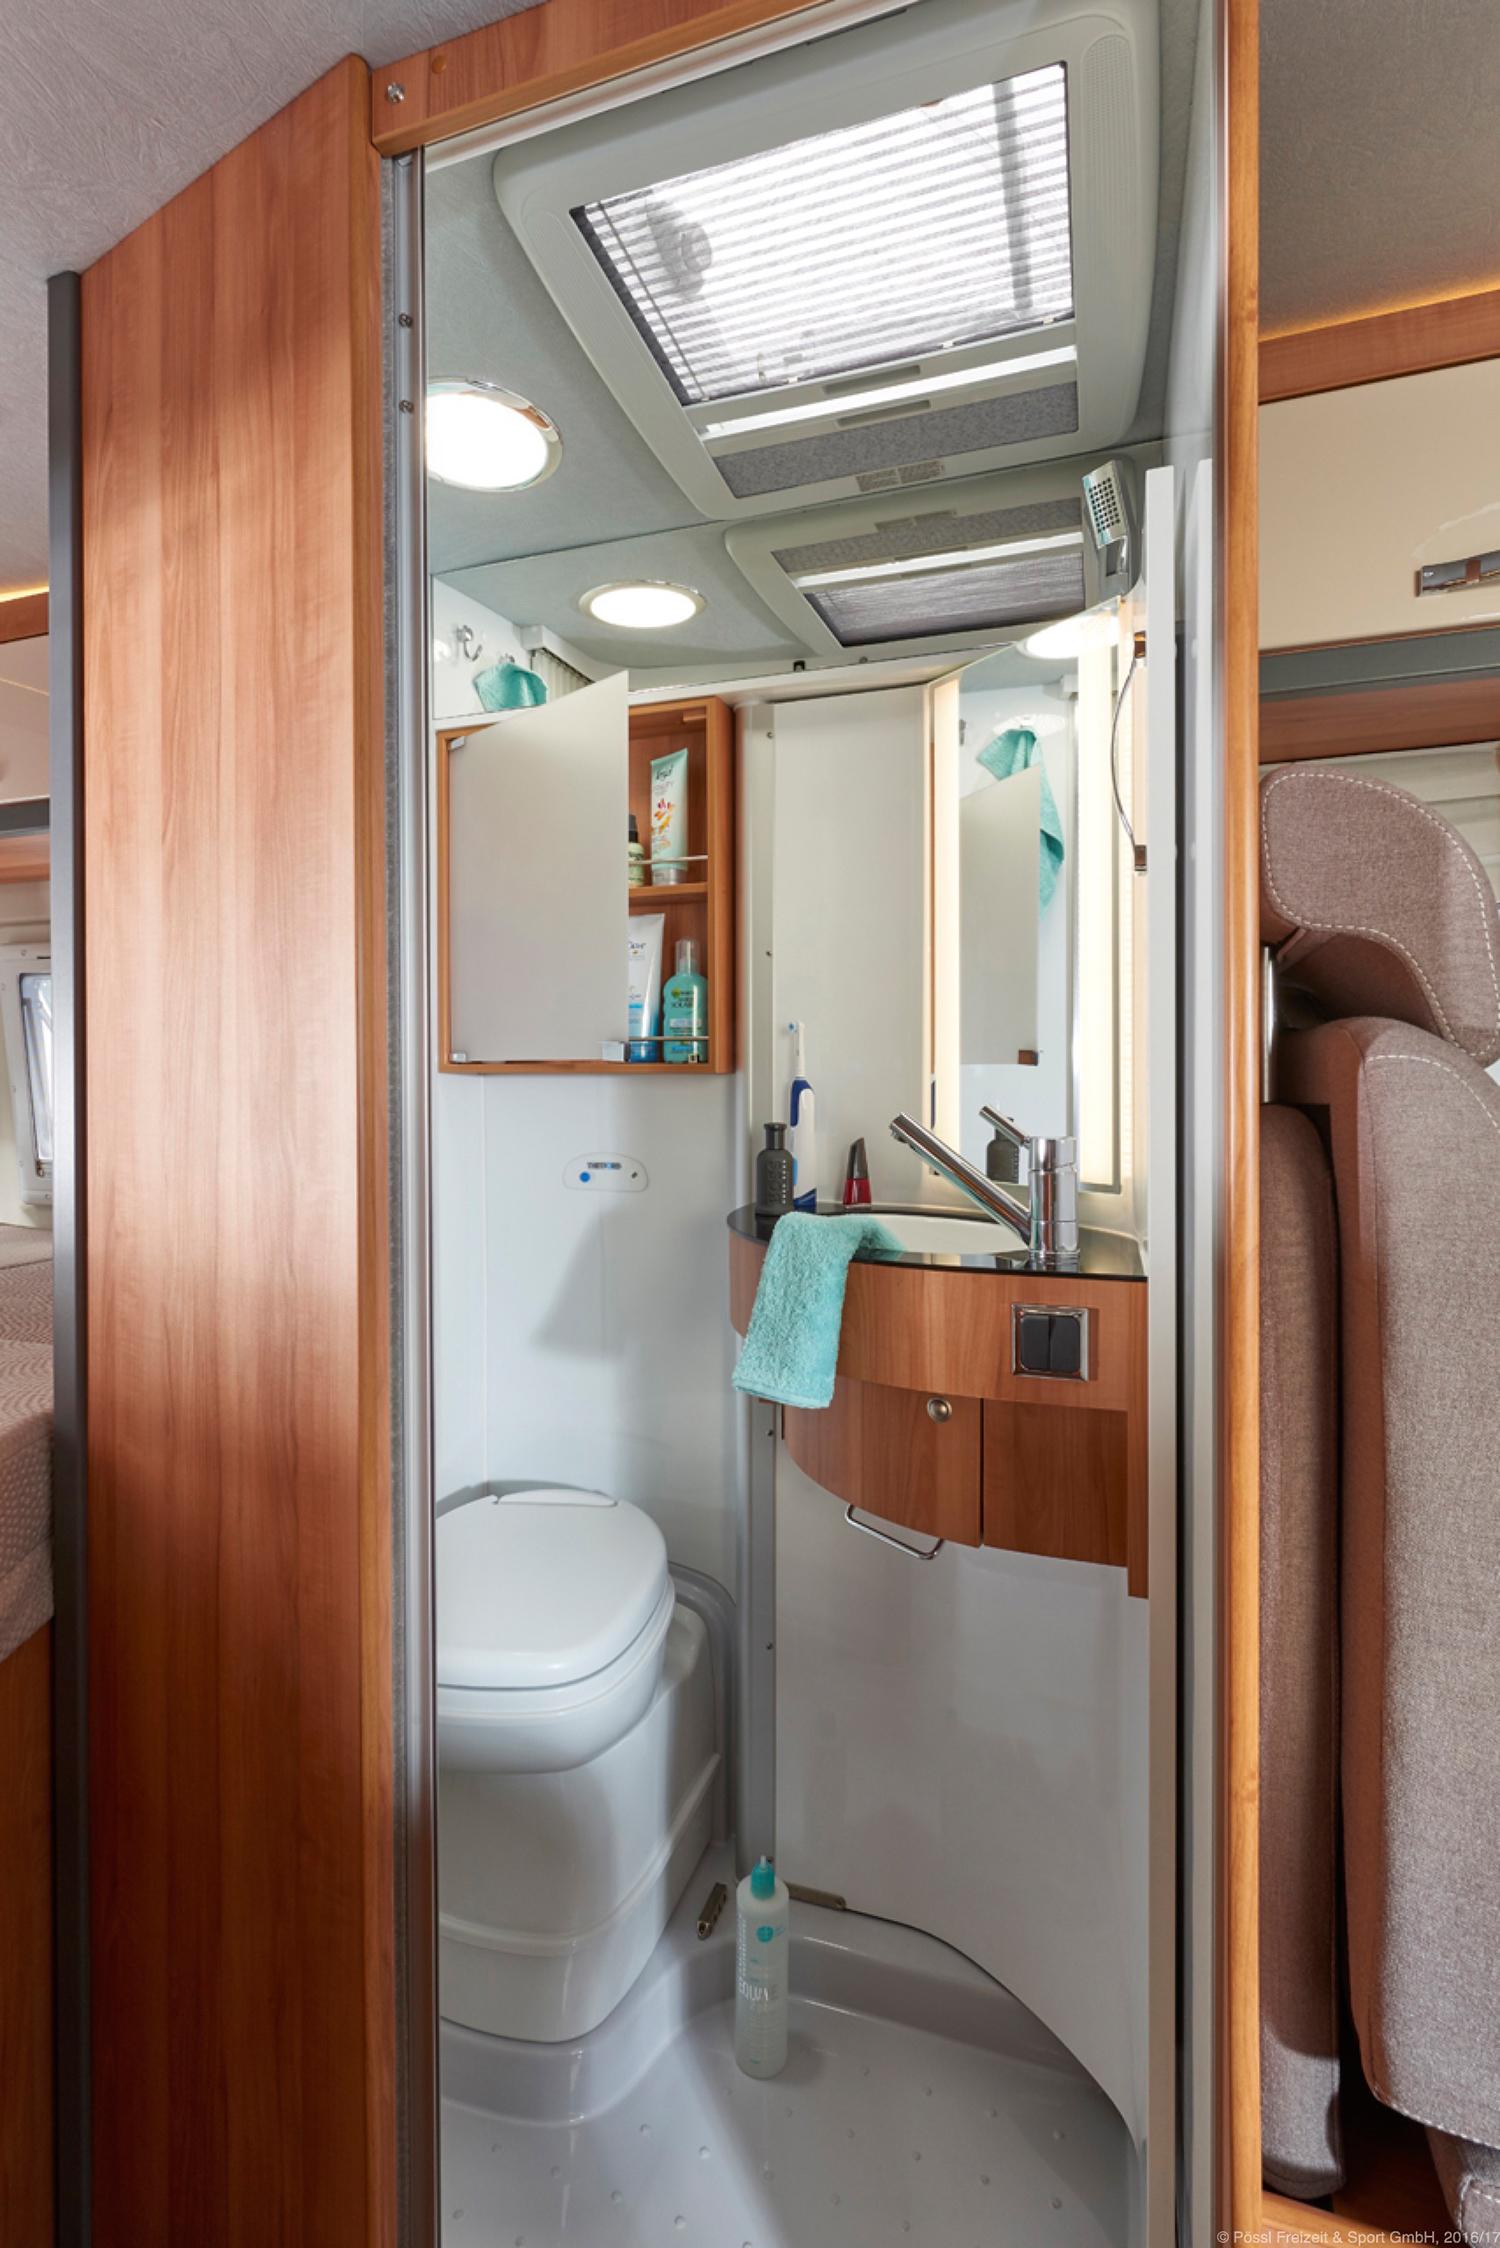 p ssl summit 600 wohnmobile. Black Bedroom Furniture Sets. Home Design Ideas